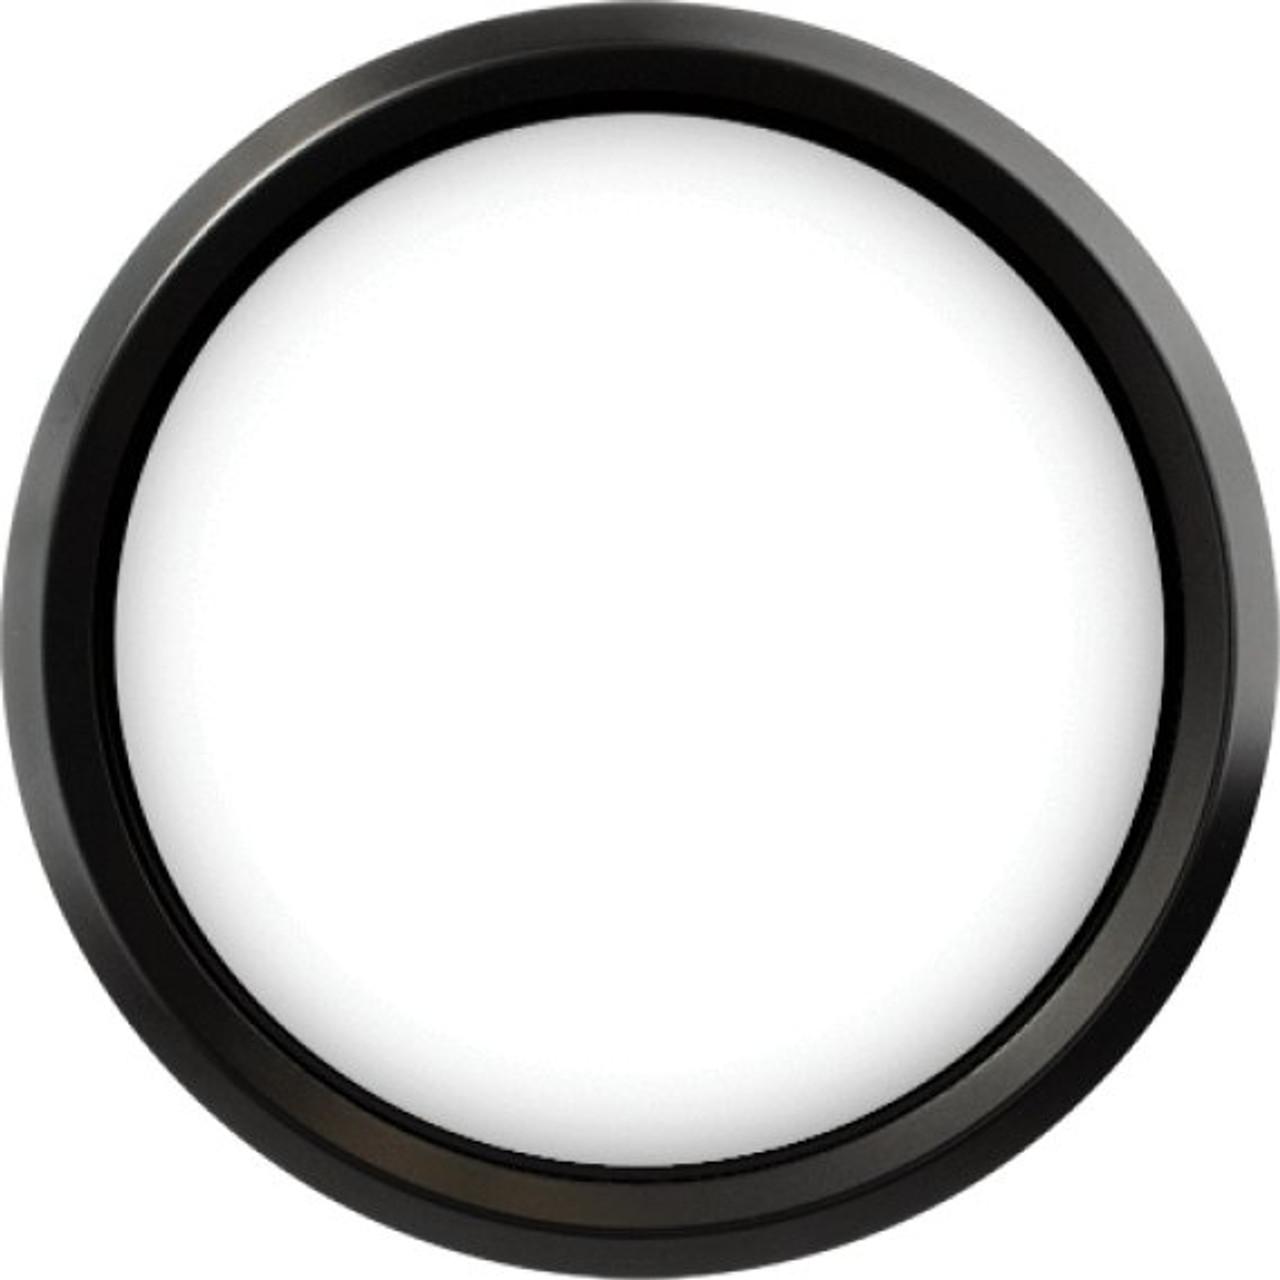 "Stealth Black Replacement Bezel for 4"" gauge"